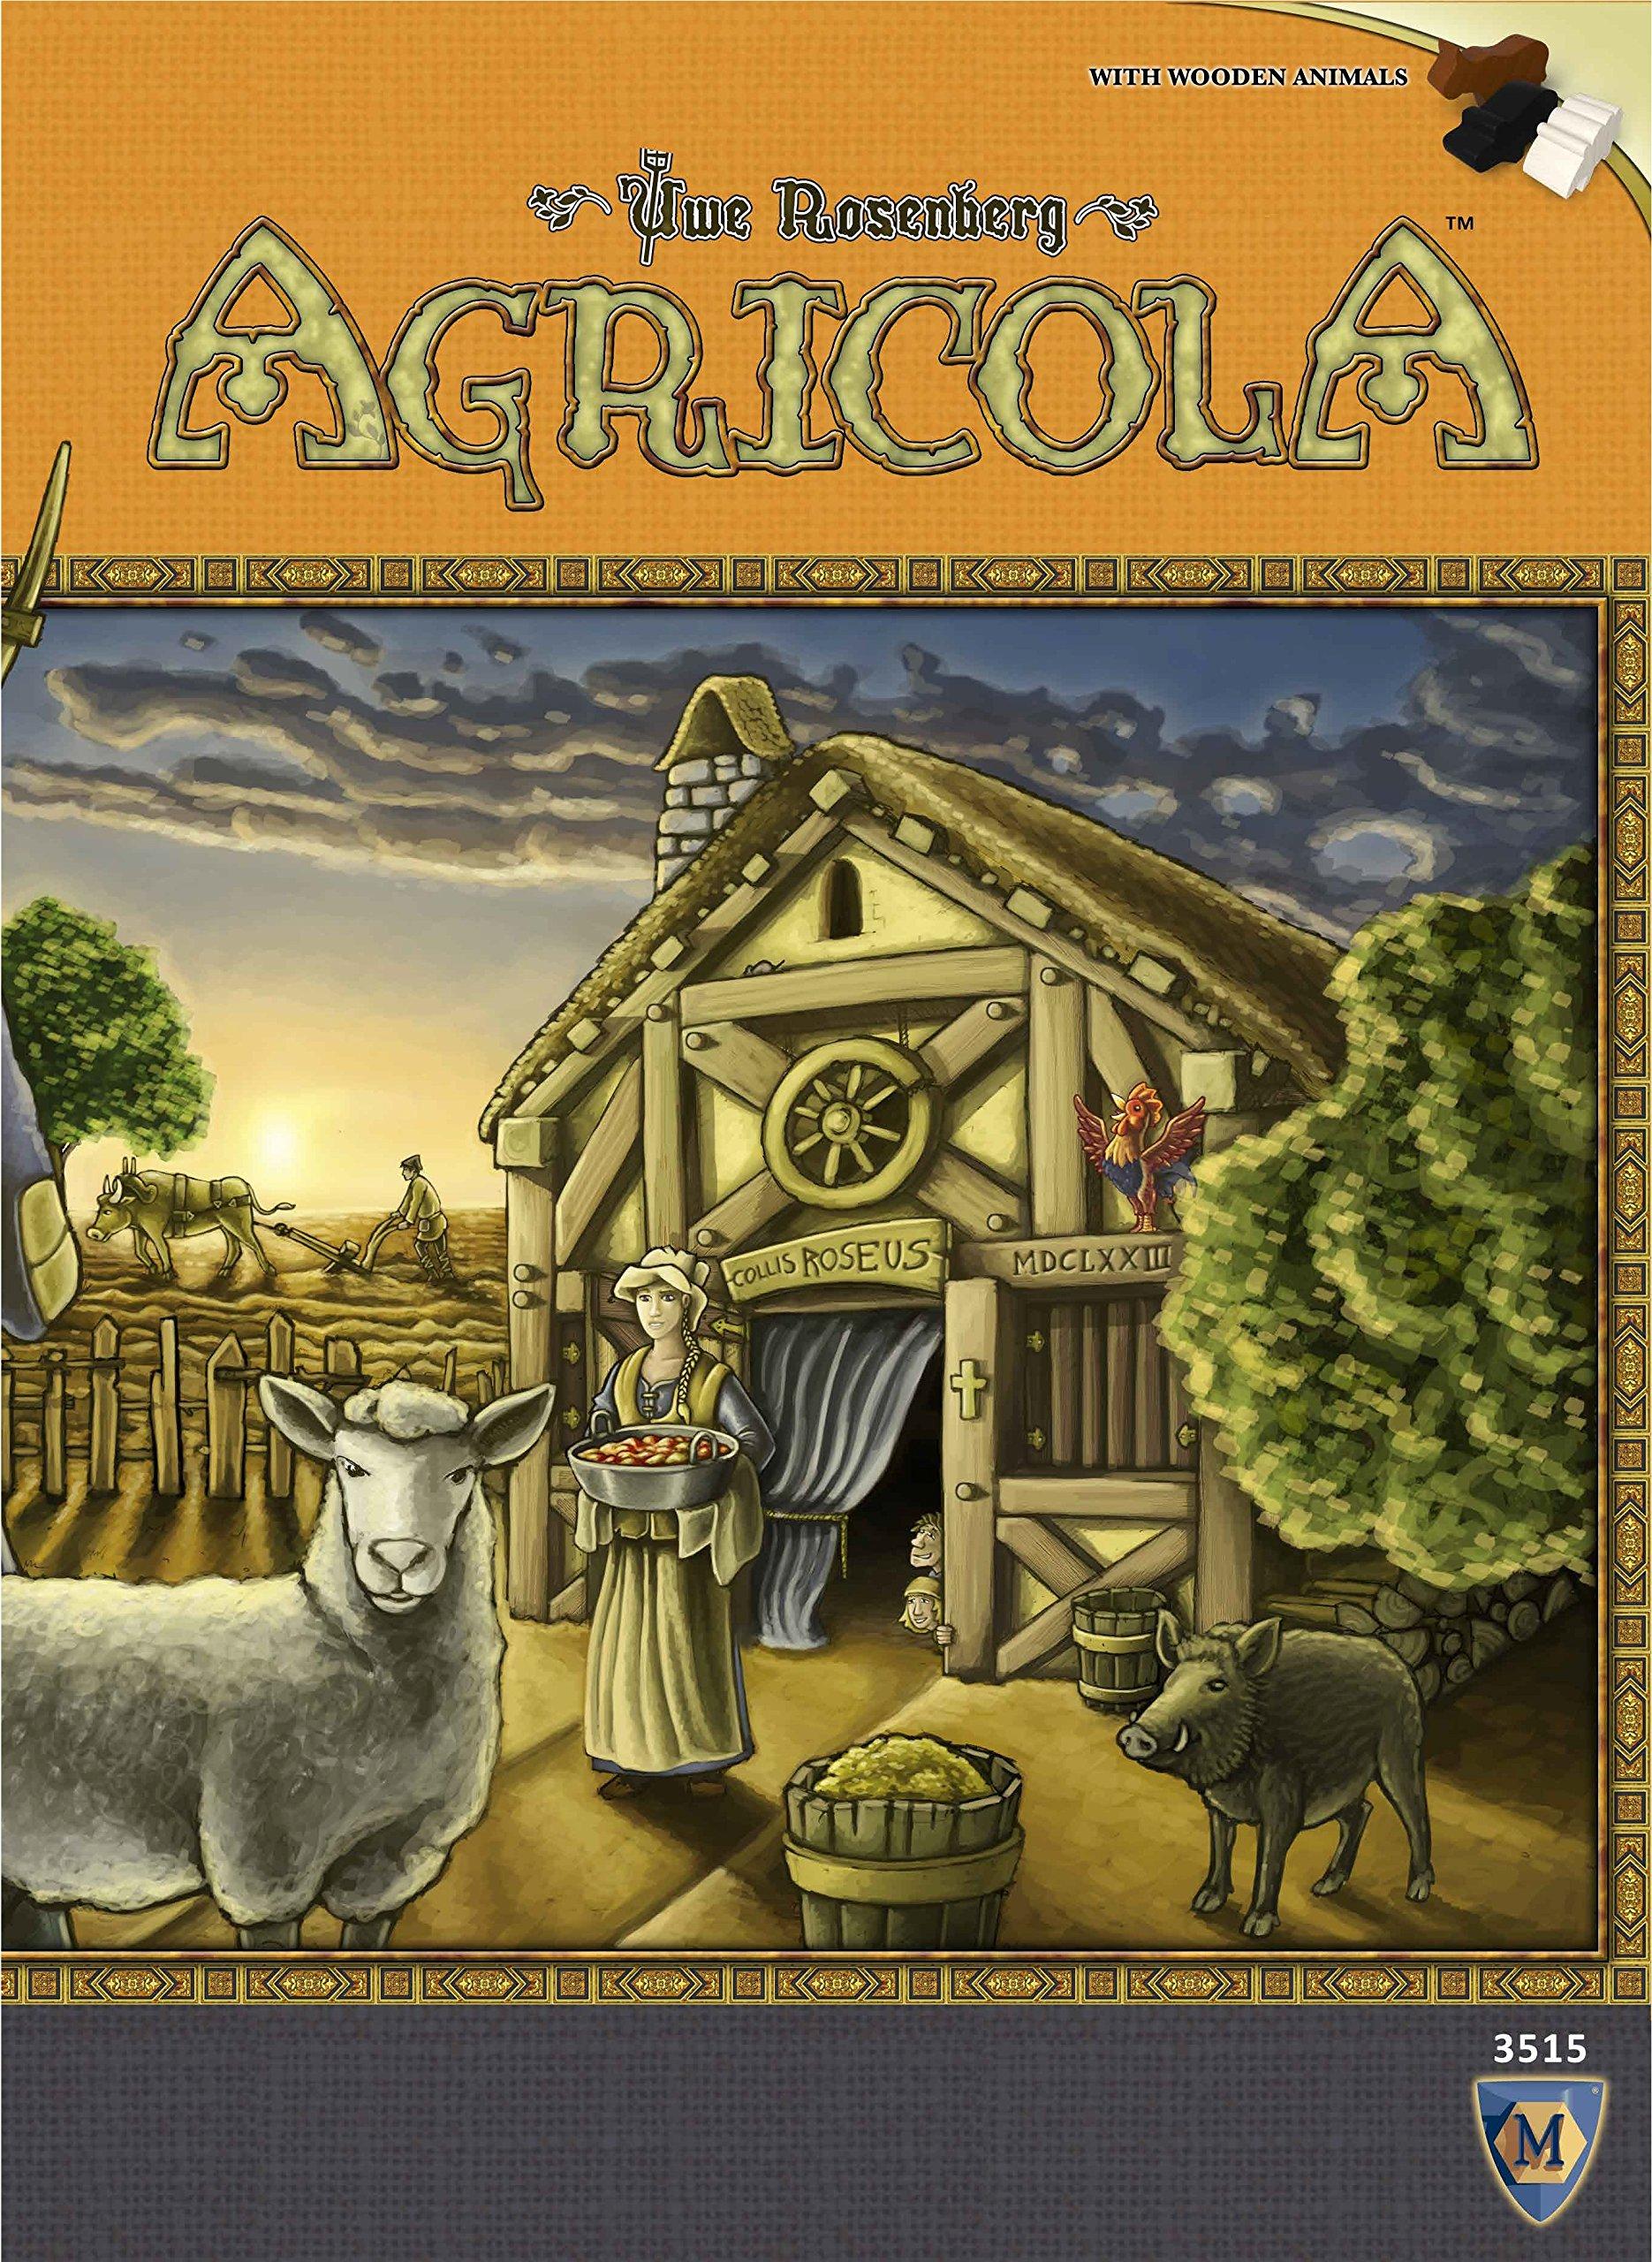 ویکالا · خرید  اصل اورجینال · خرید از آمازون · Agricola wekala · ویکالا